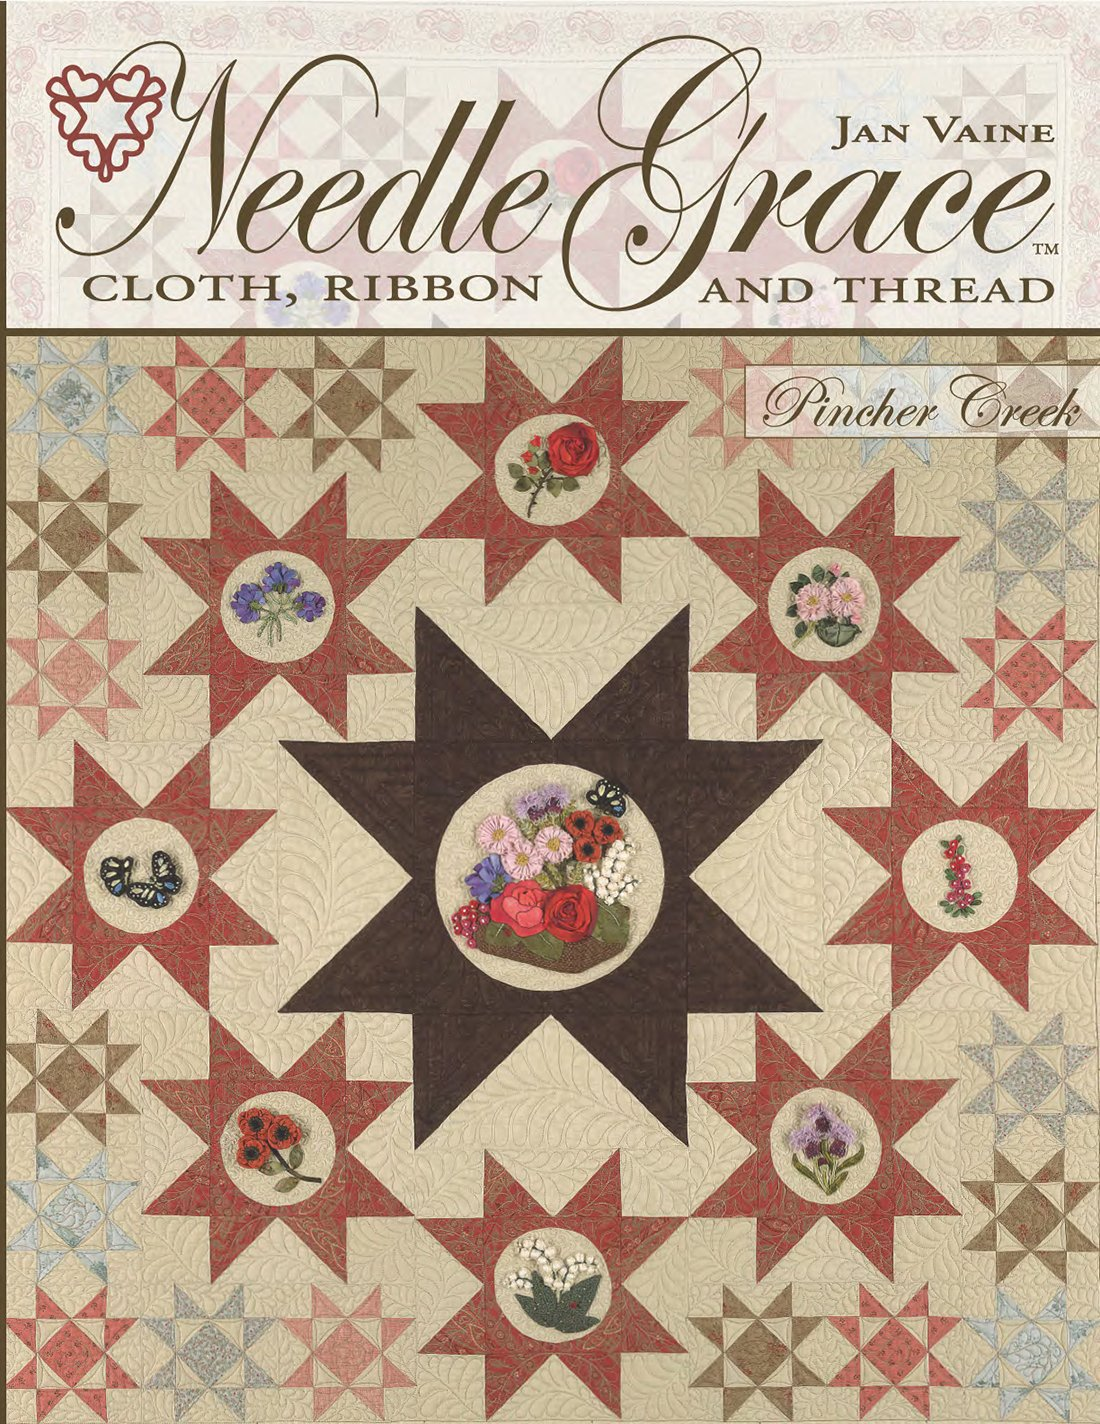 GCC Needle Grace